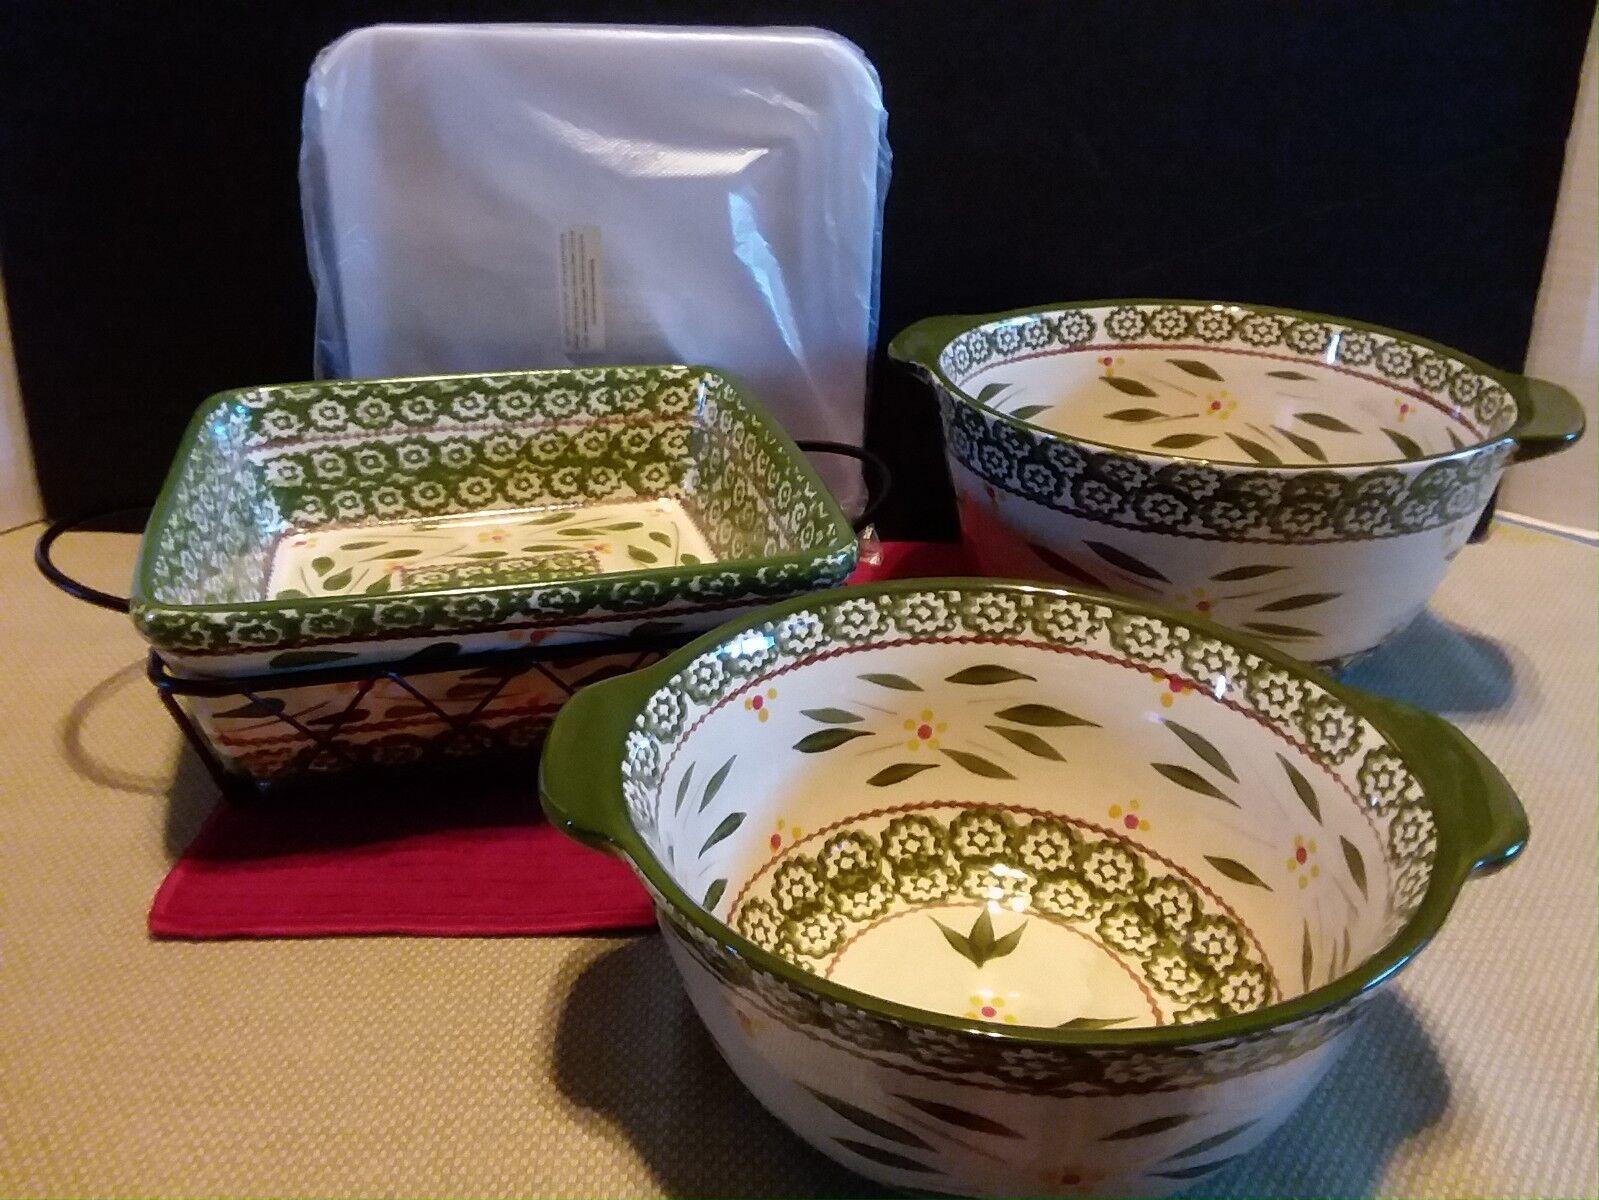 TEMP-tations 6 pc Old World Vert Ensemble d'Ustensiles de Cuisson Baking Set Cookware